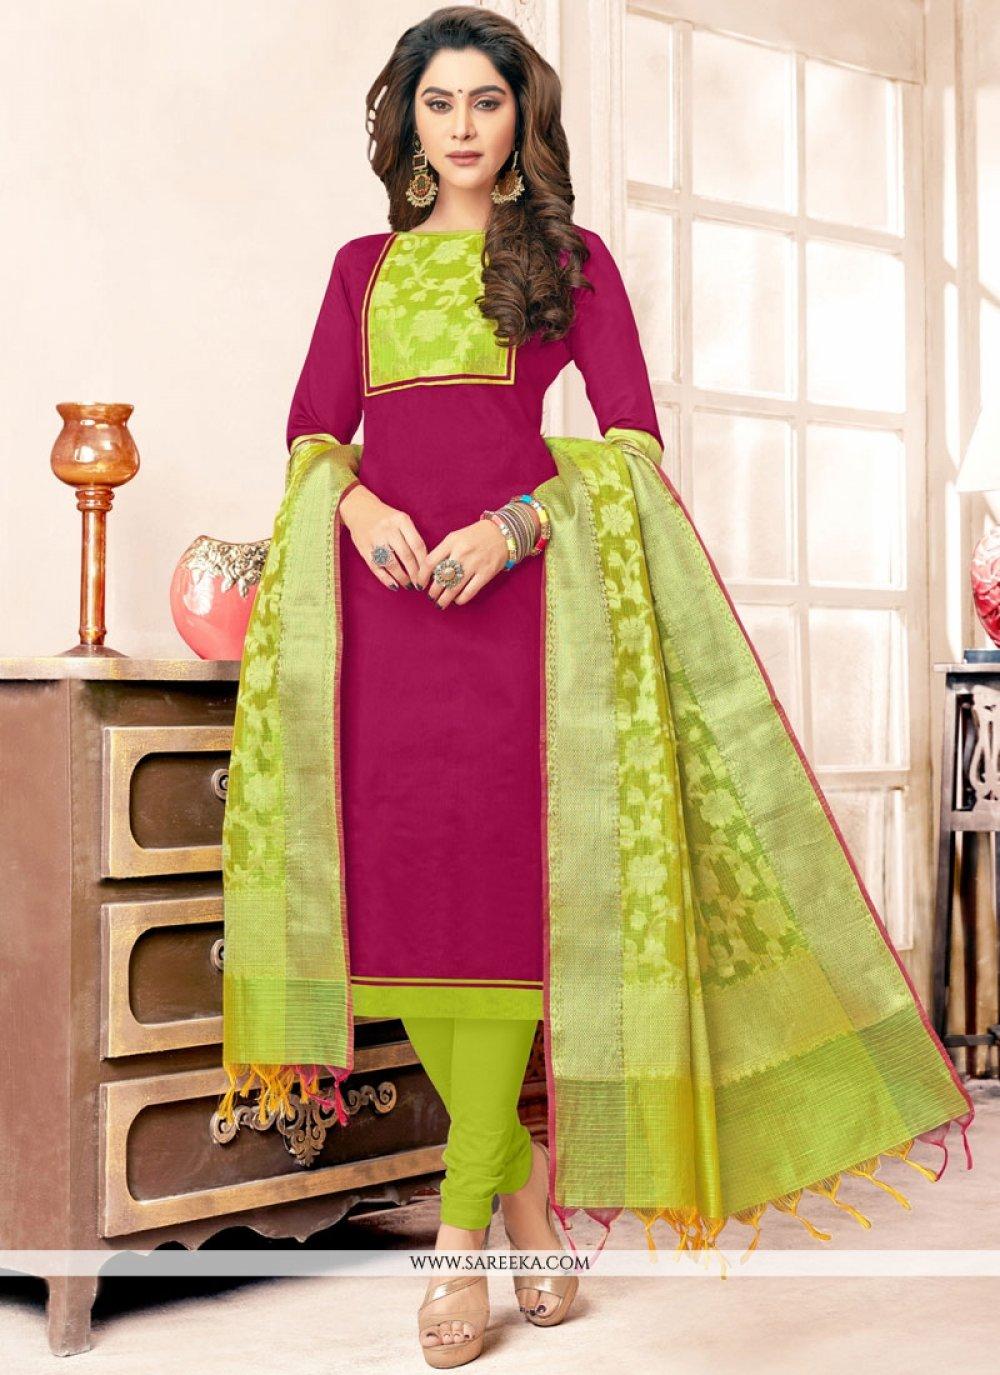 Resham Work Cotton   Green and Hot Pink Salwar Kameez